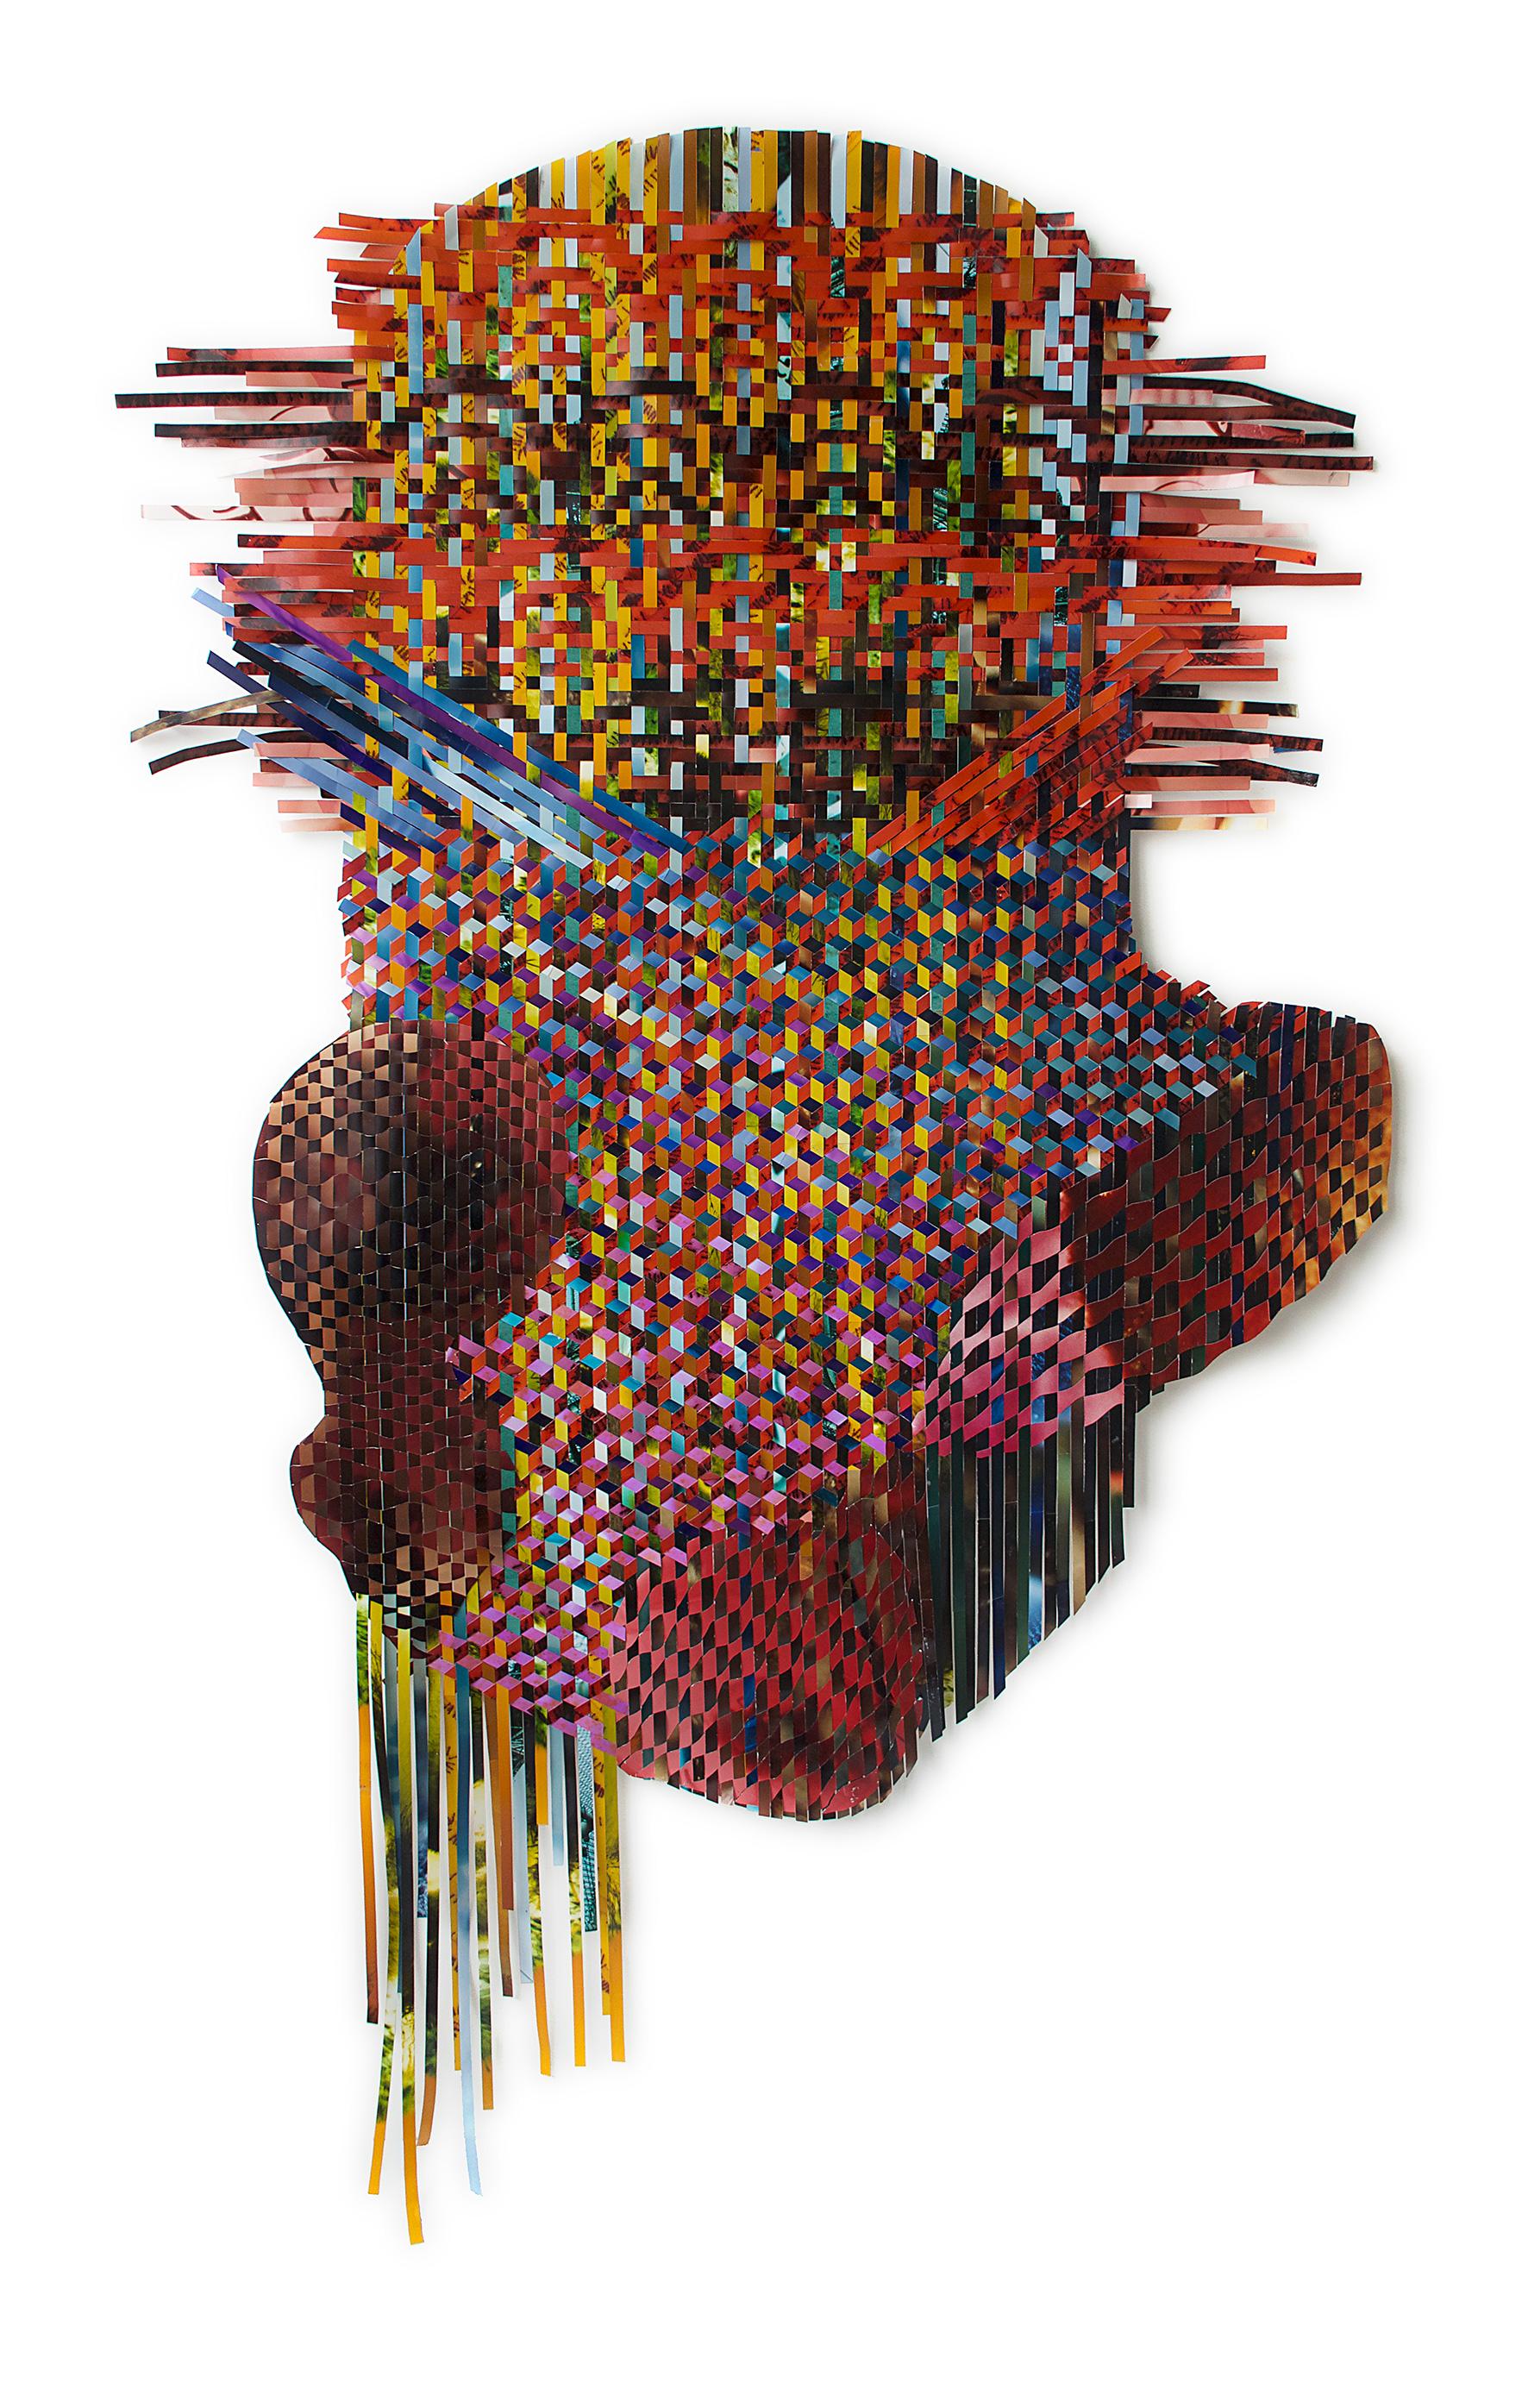 Tomas Nakada's work entitled Oyejo, made of cut, woven photographs